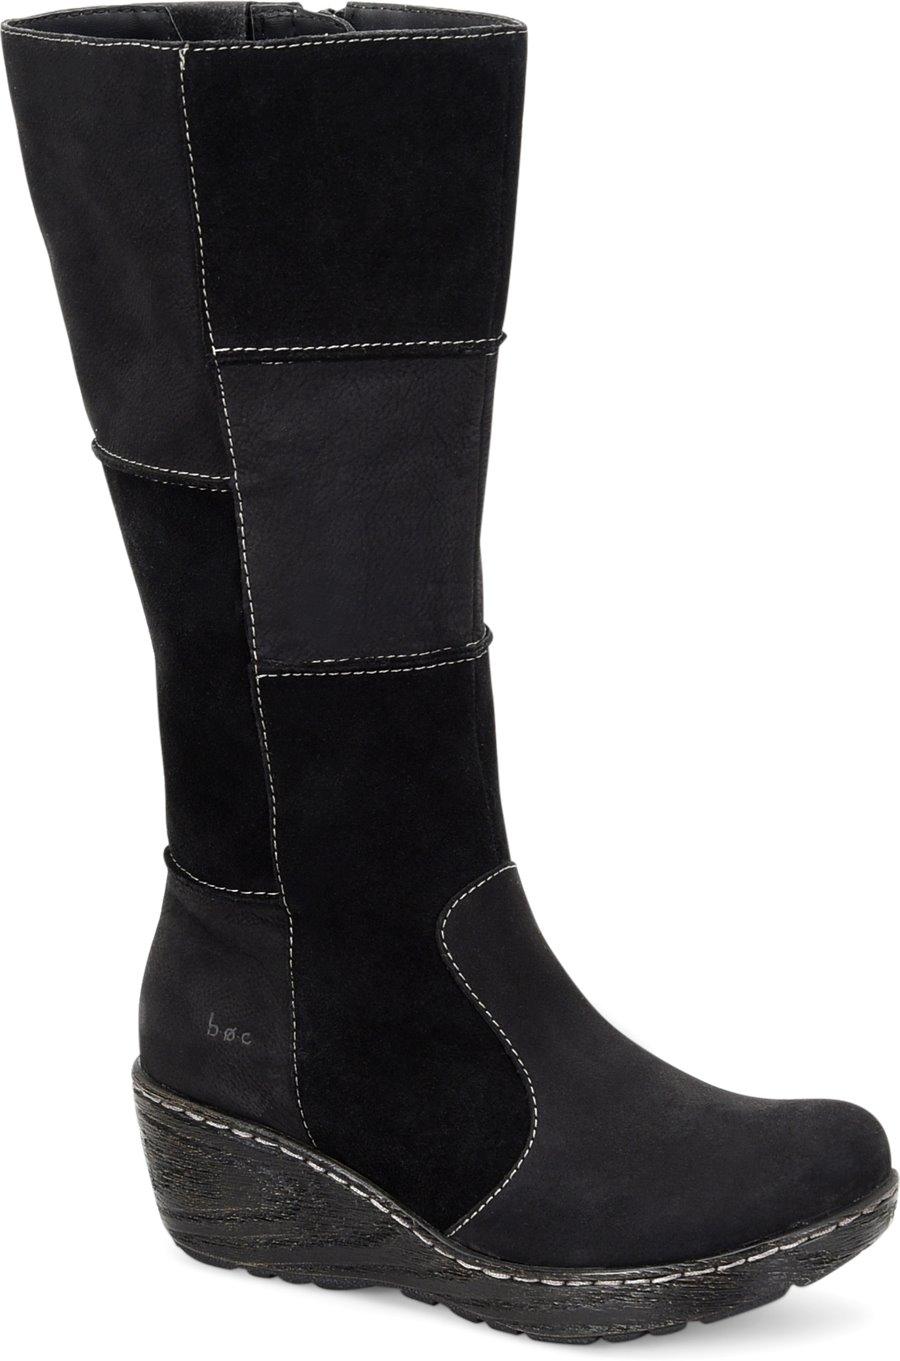 Boc Nix In Black Boc Womens Boots On Shoeline Com